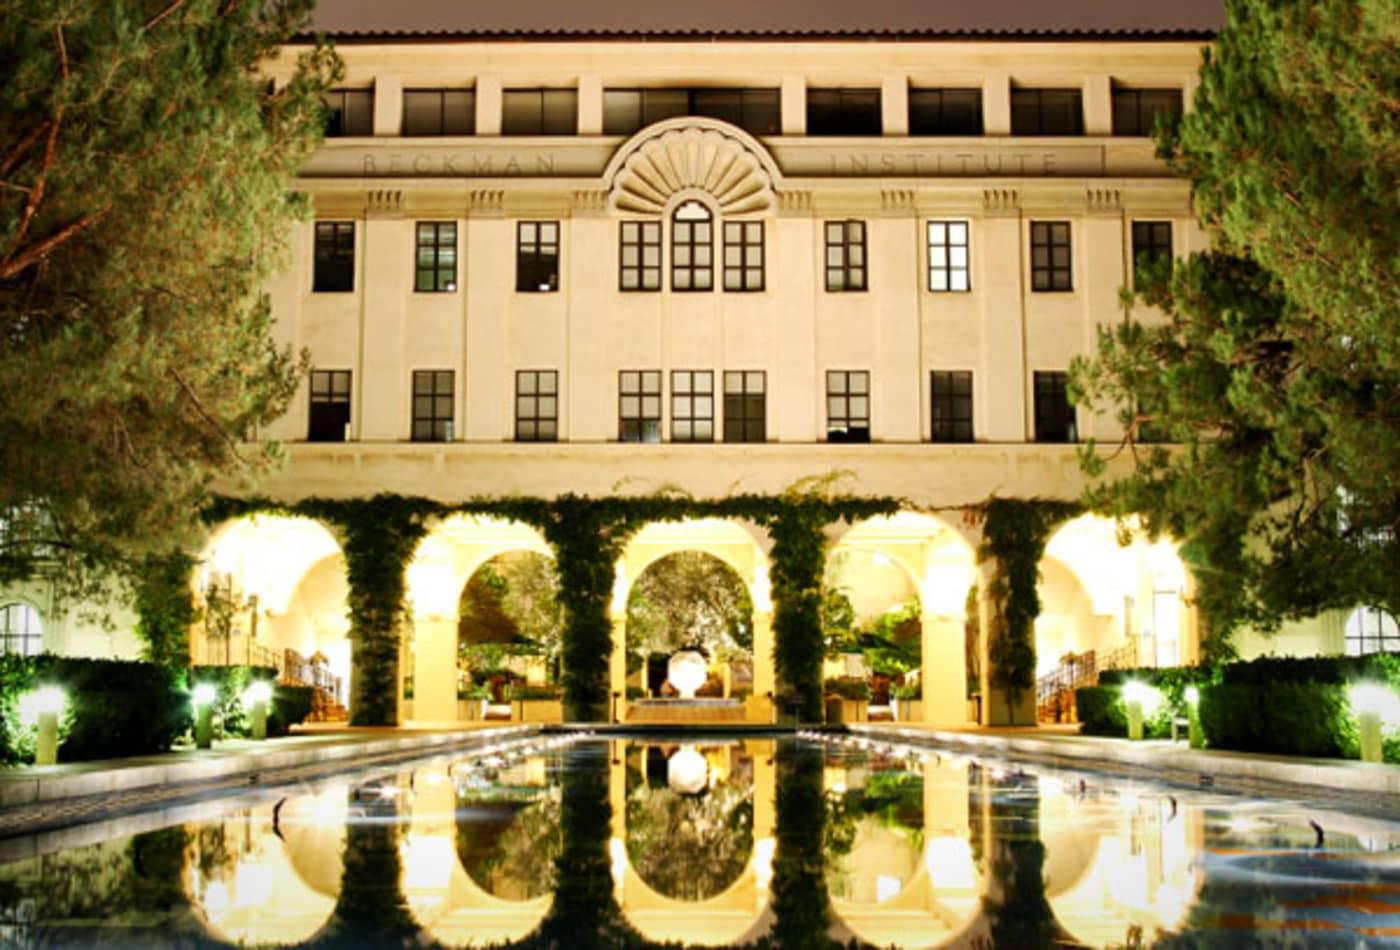 Caltech-Colleges-Highest-Paychecks-2012-CNBC.jpg